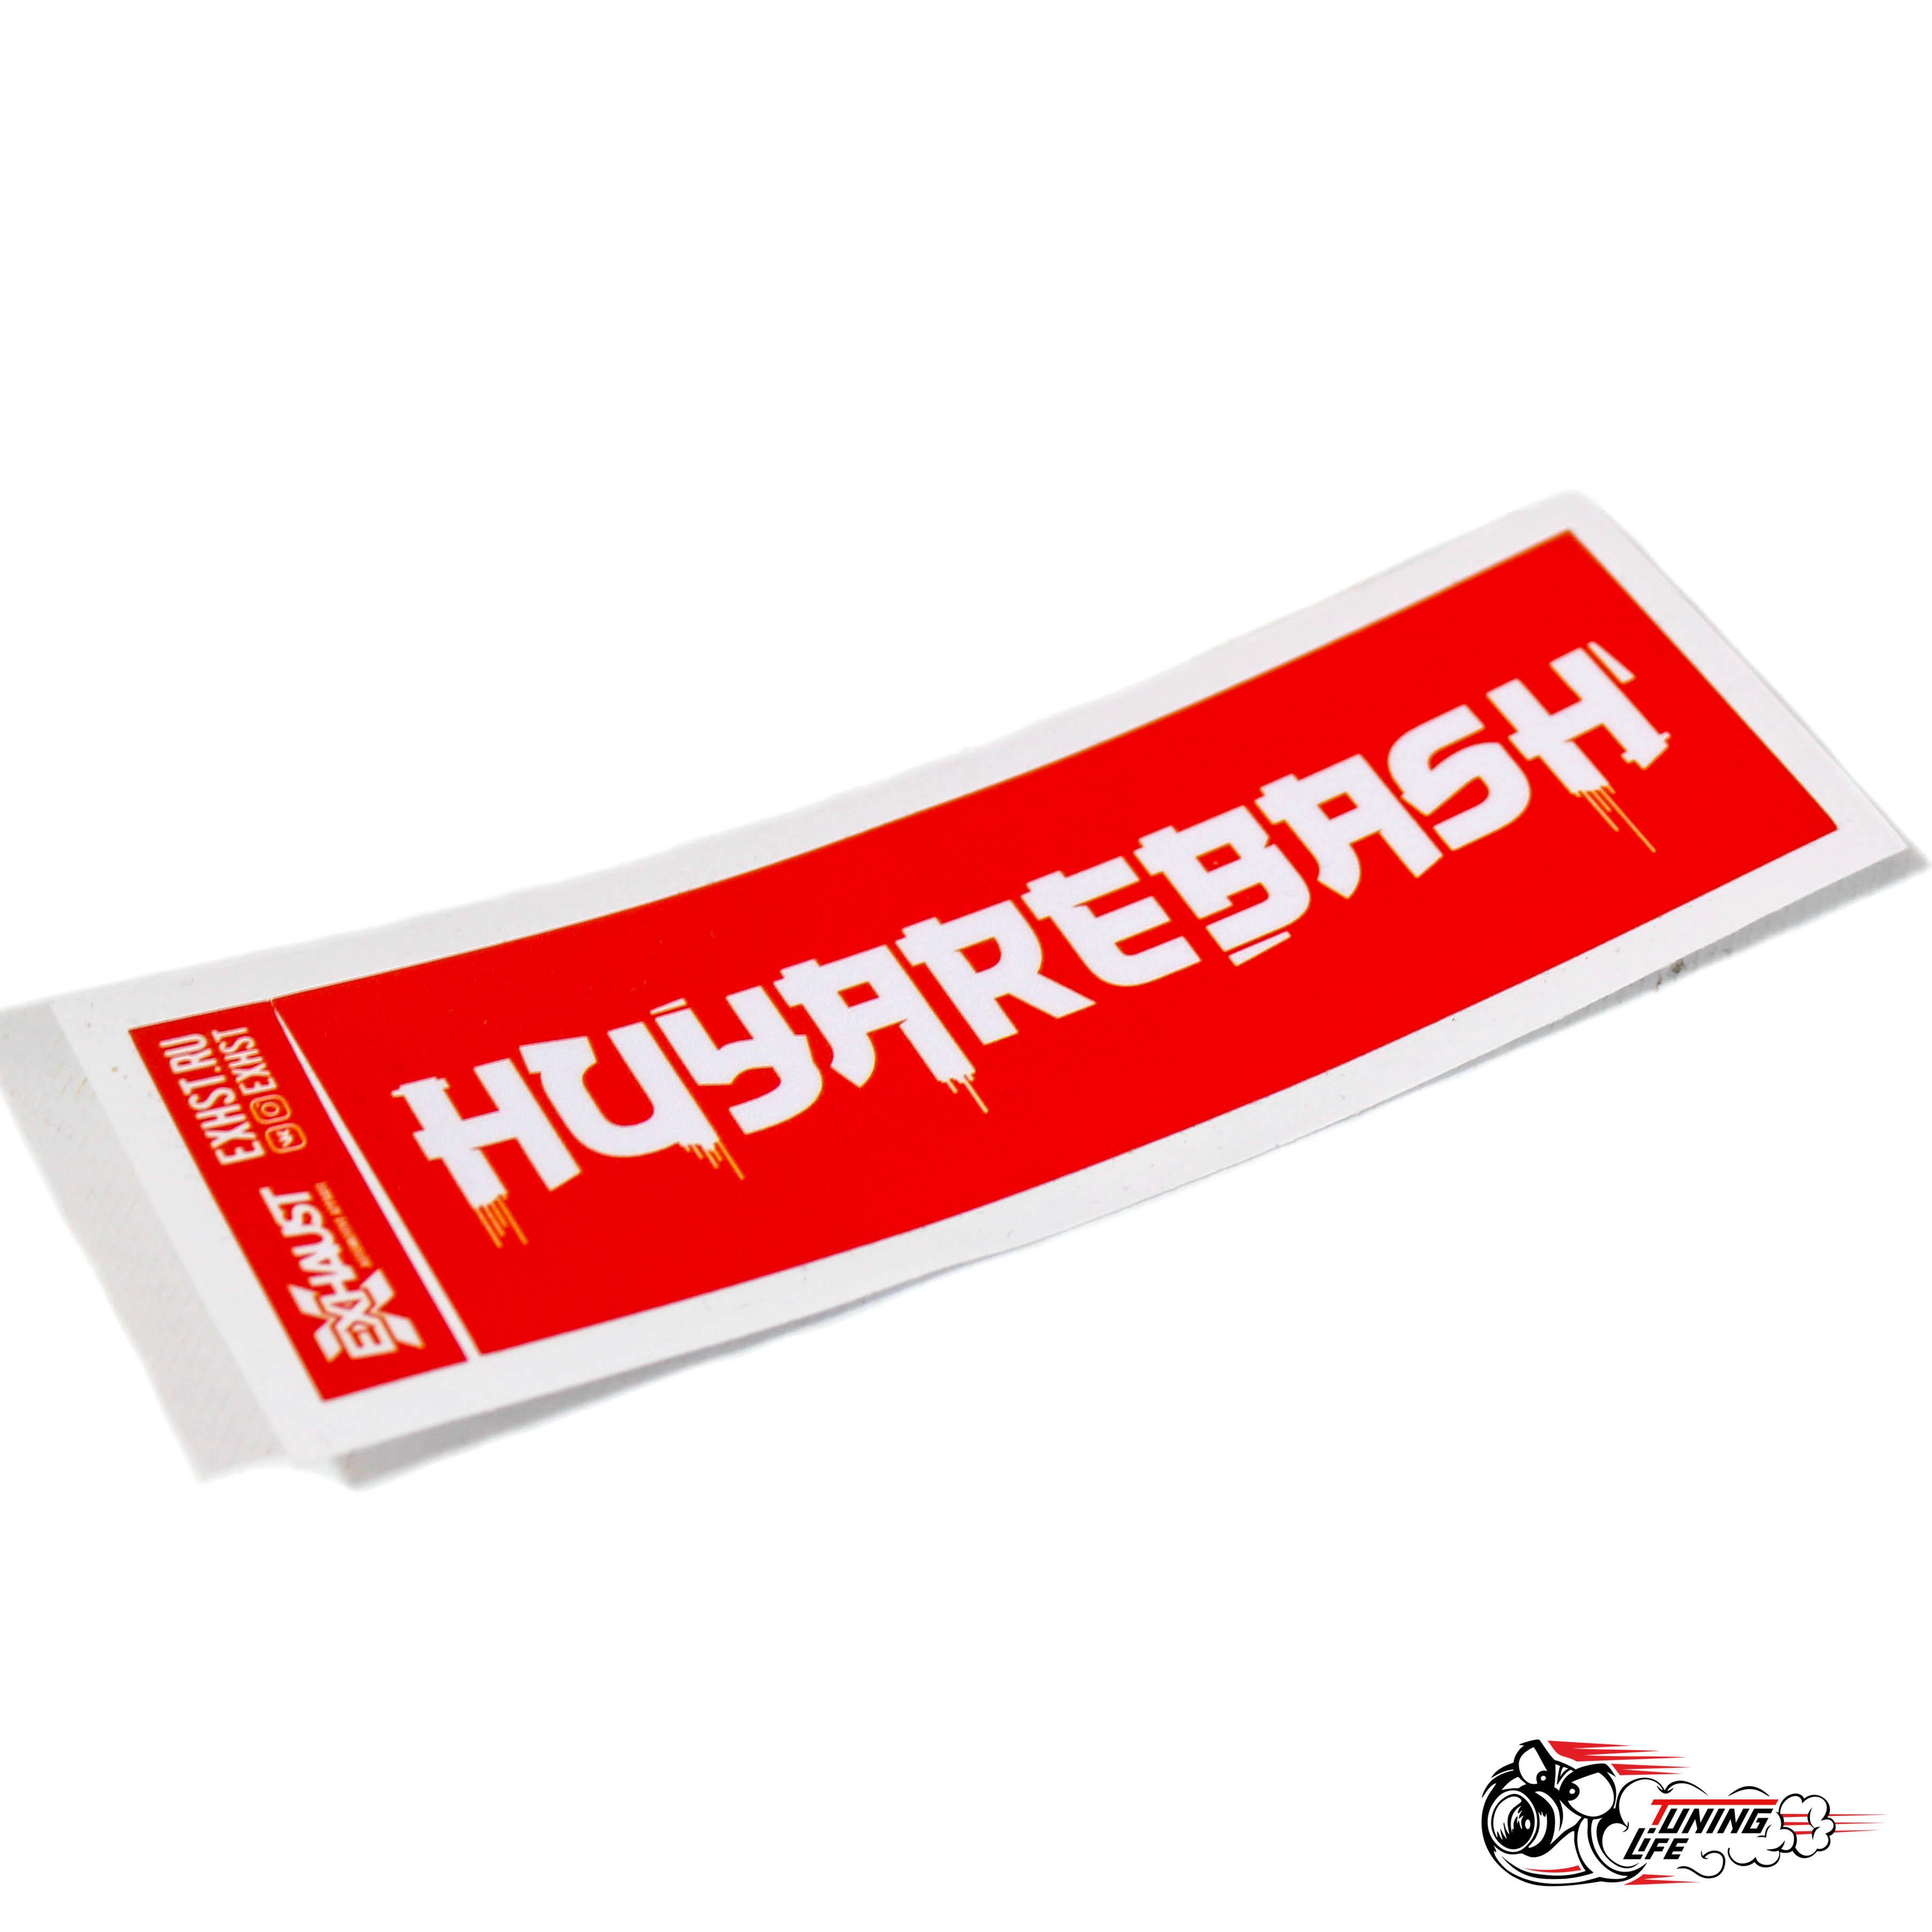 Стикер Huyarebash